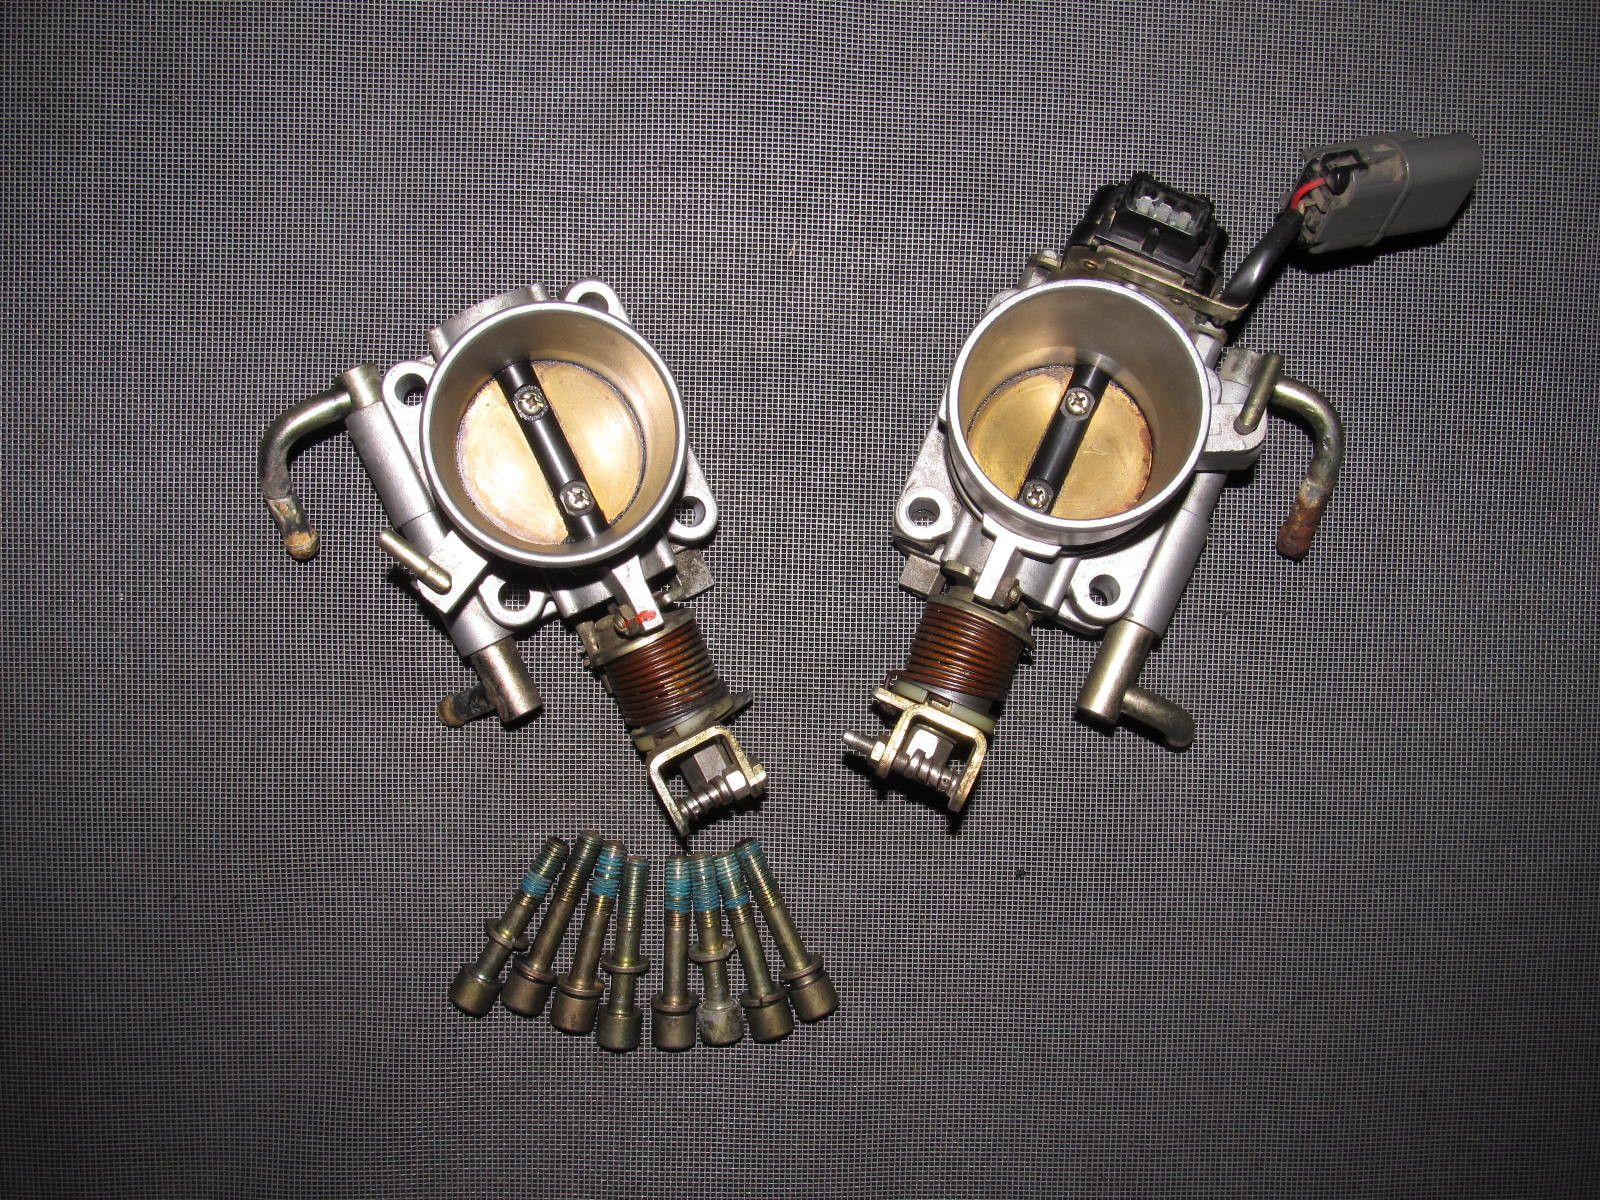 90 91 92 93 94 95 96 Nissan 300zx OEM Throttle Body & Tps Sensor - Set